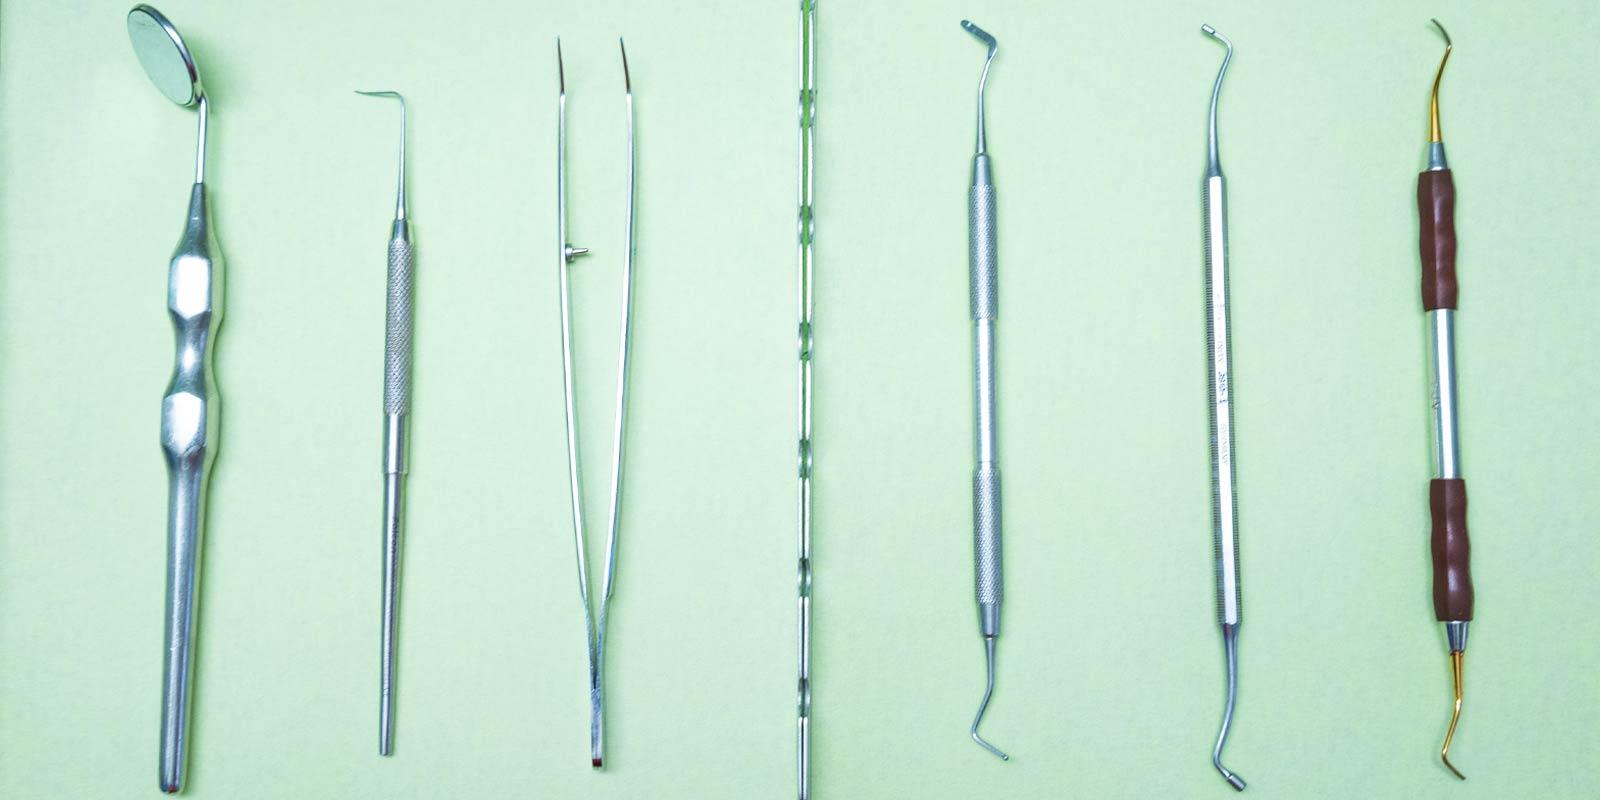 studio-dentistico-dottor-gola-casteggio-odontoiatria-pavia-dentista-implantologia-ortodonzia-protesi-chirurgia-75